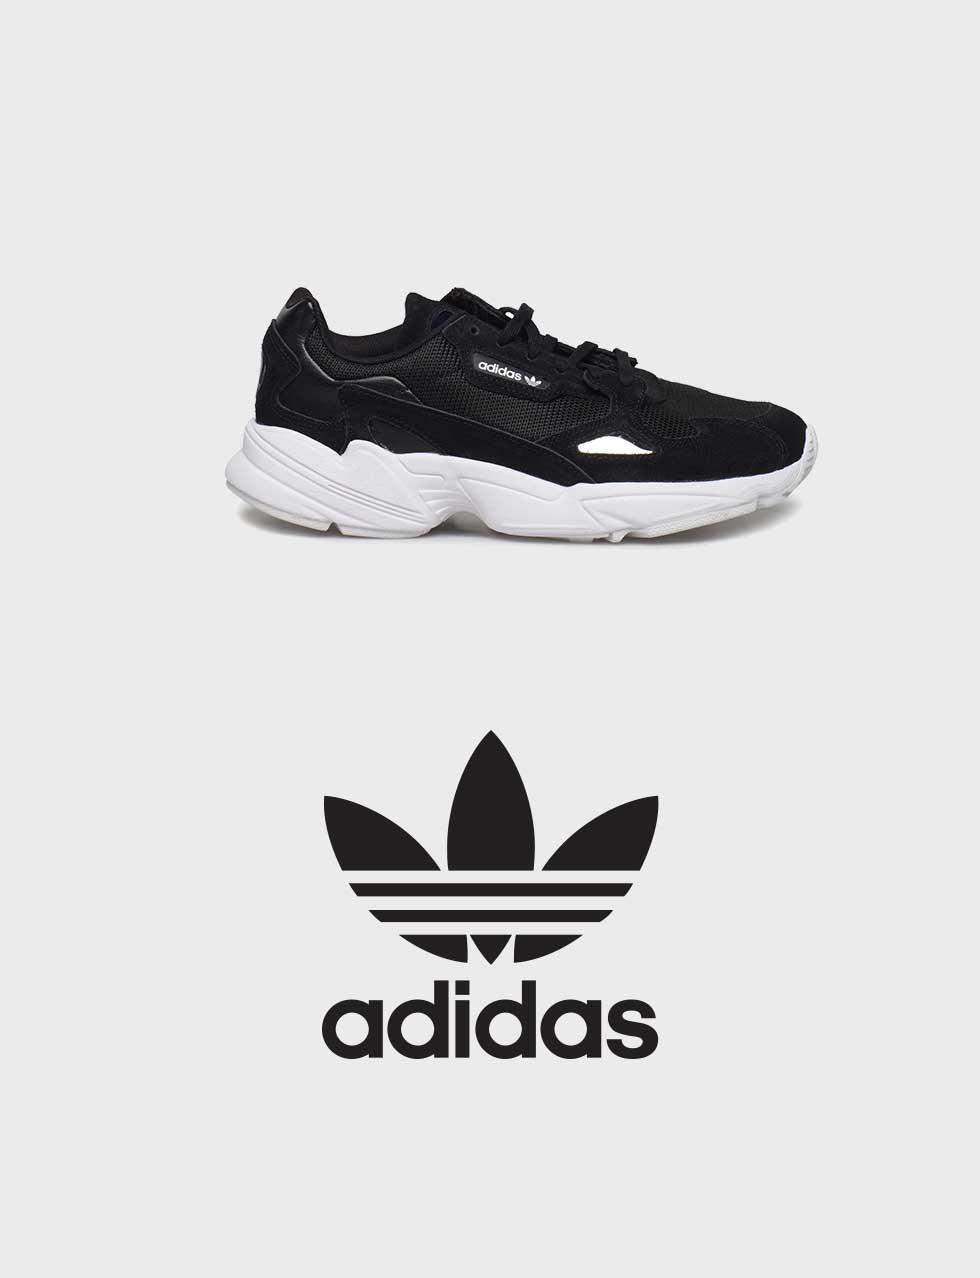 W38_6A_athleisure_w_carousel_adidas_image_2